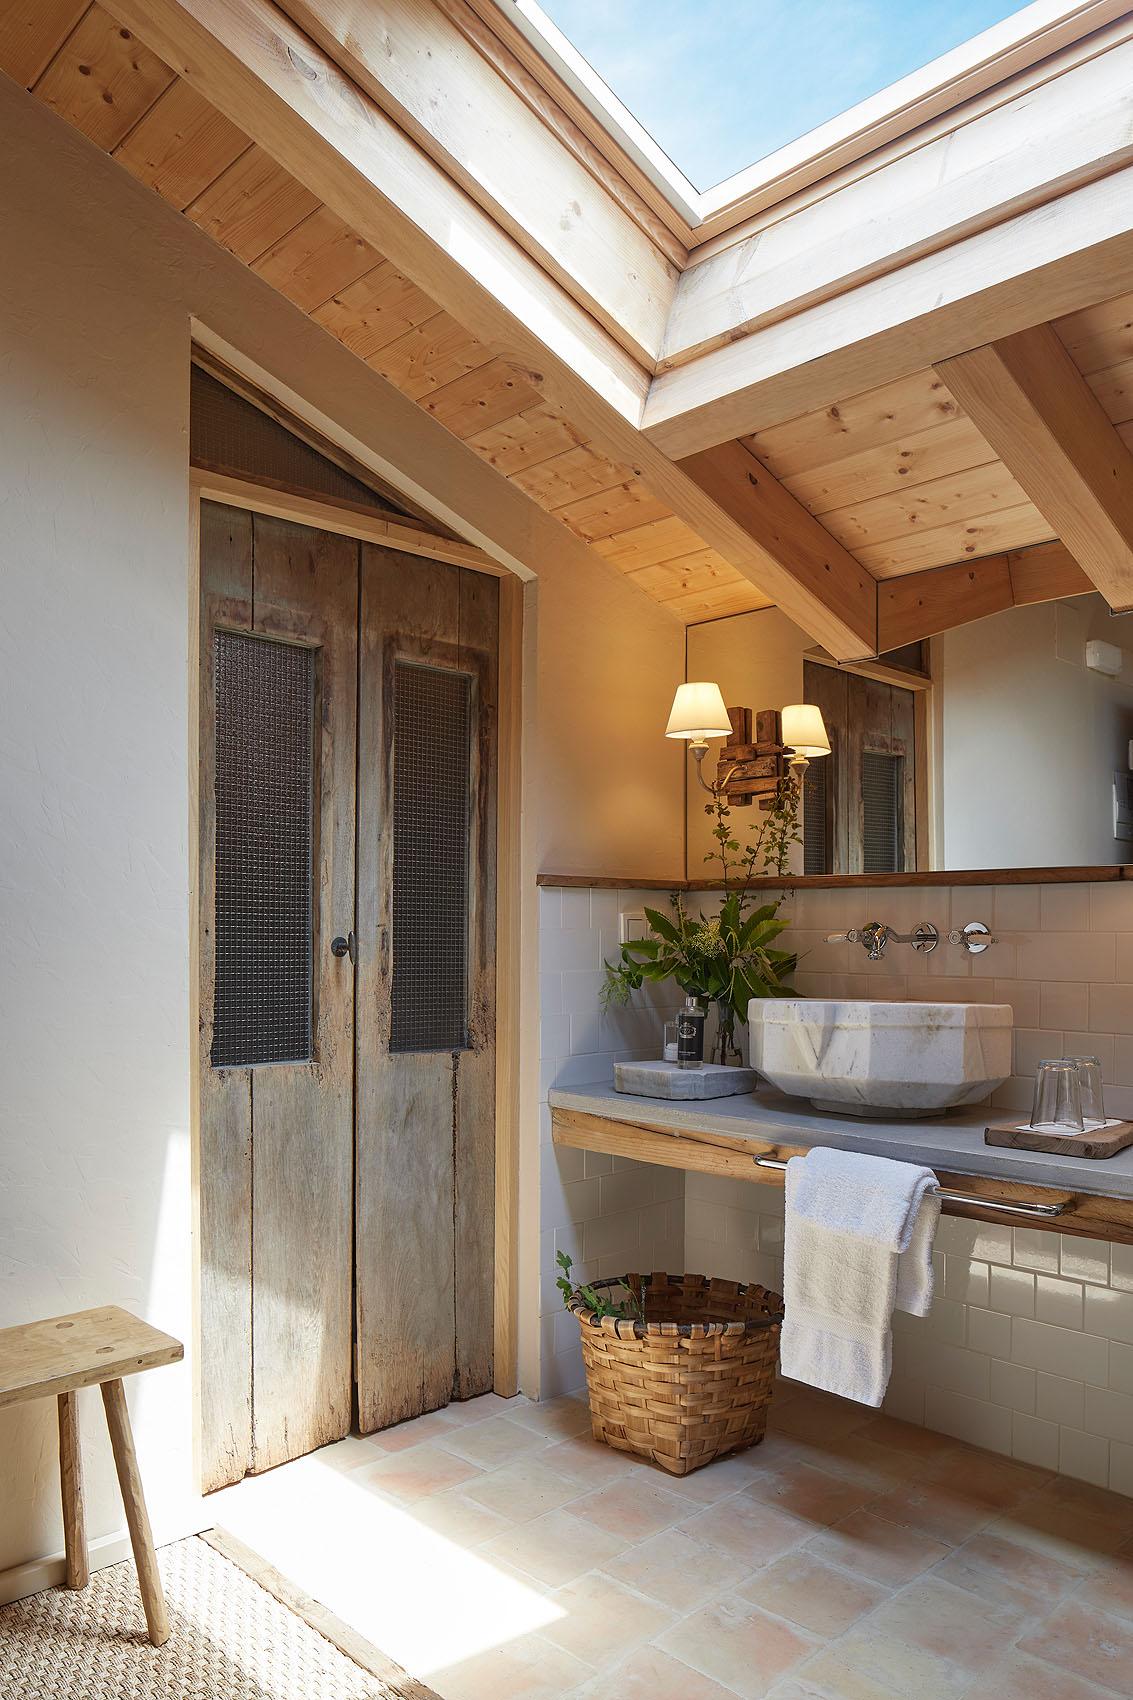 Oar Cottage - Iñaki Caperochipi - Fotografía